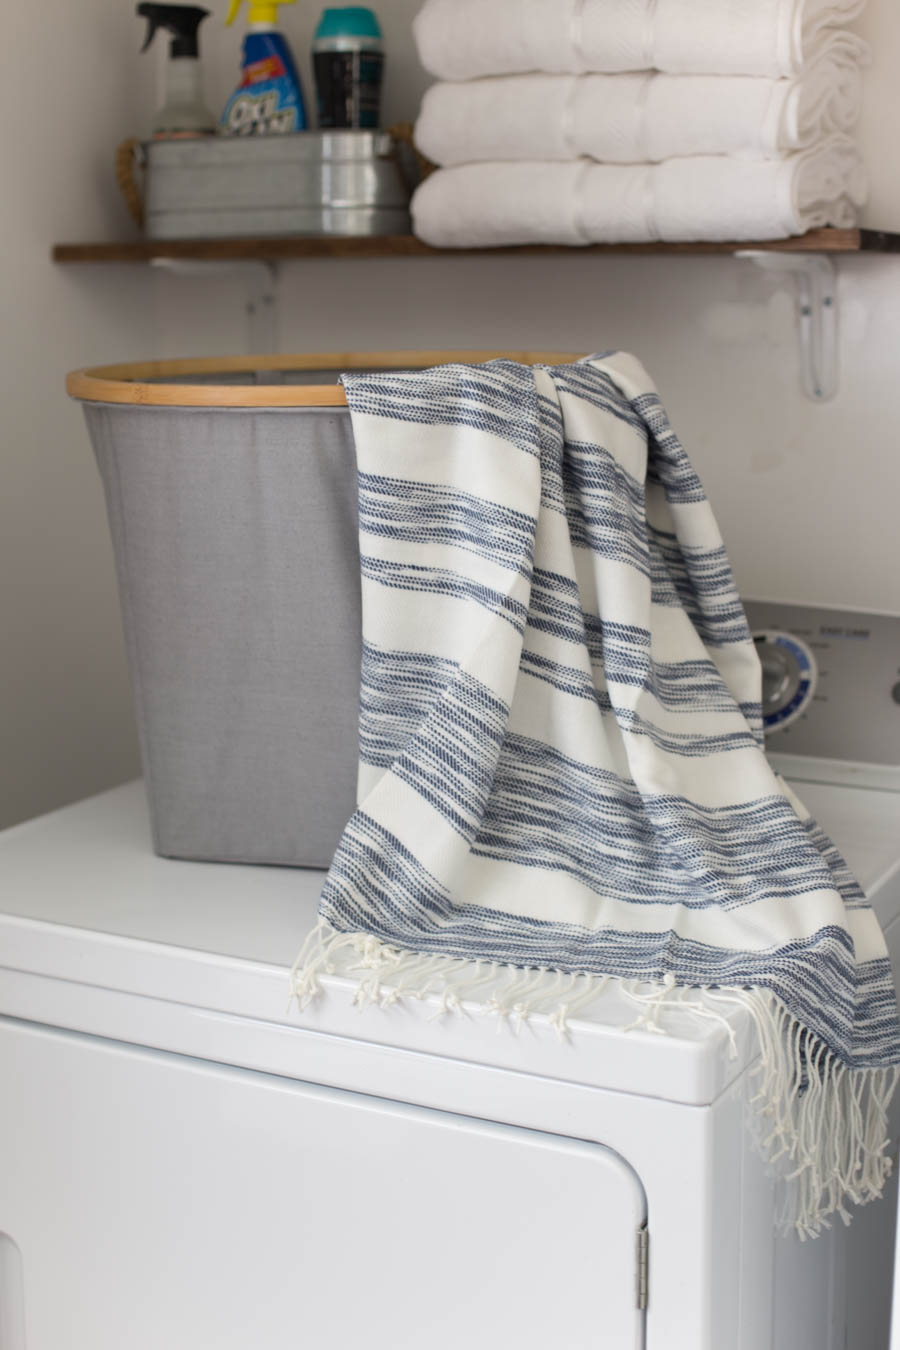 Laundry Closet Organization-10